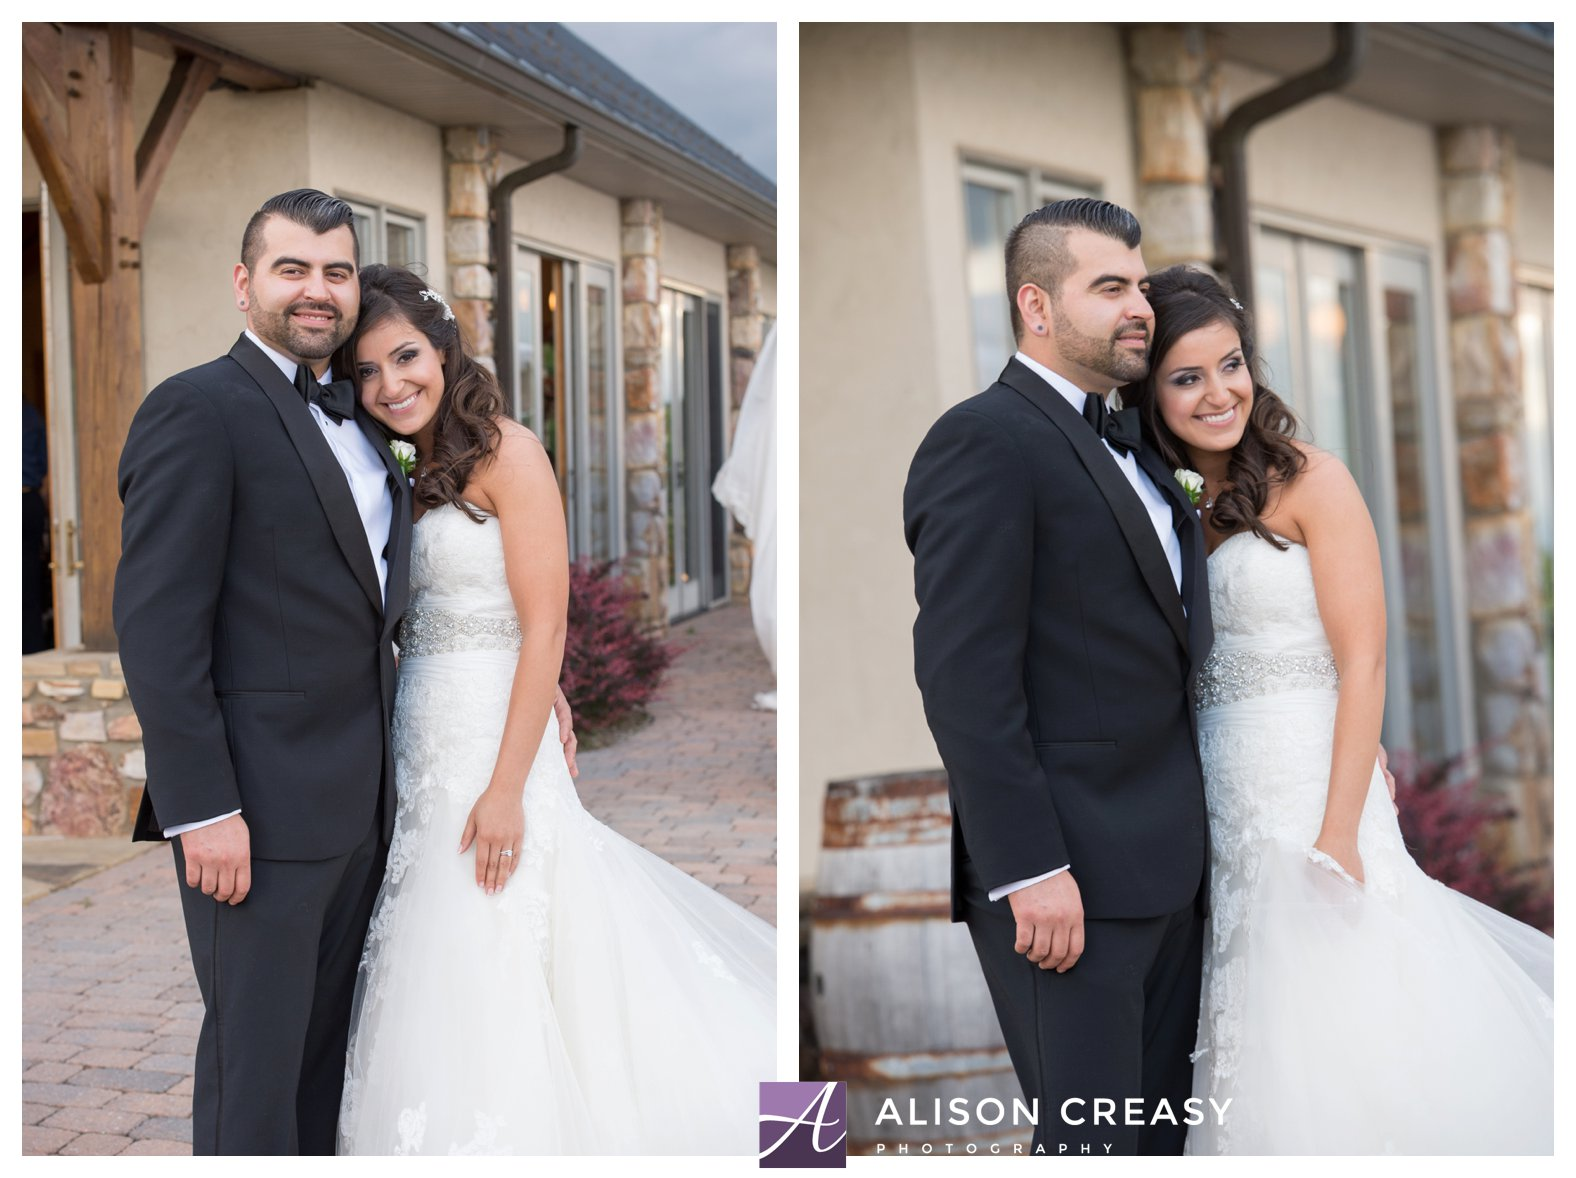 Marisol&Sergio_0021.jpg